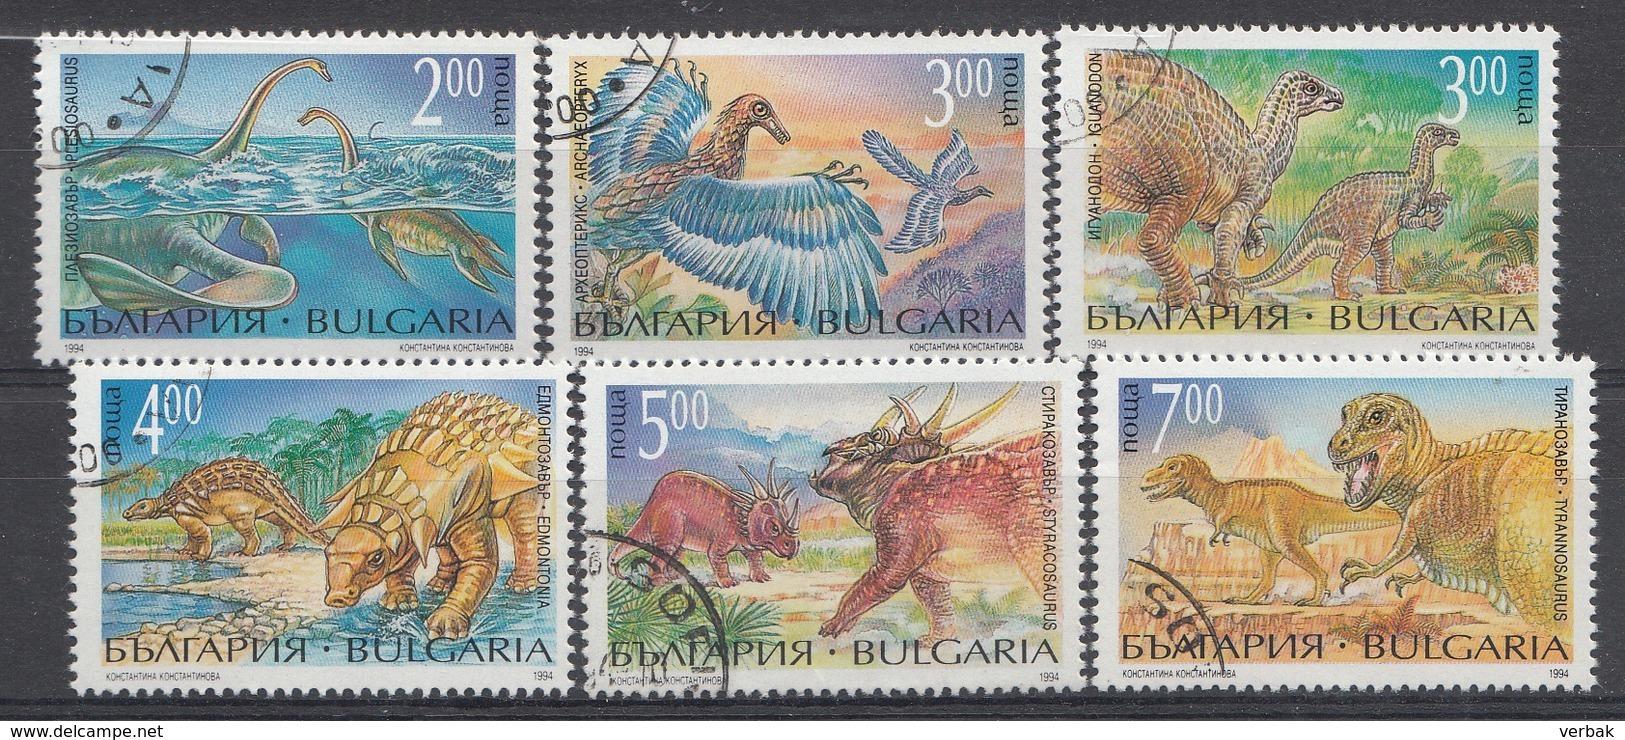 BULGARIE Mi.Nr: 4109-4114 Prähistorische Tiere  Oblitèré / Used / Gebruikt - Usati